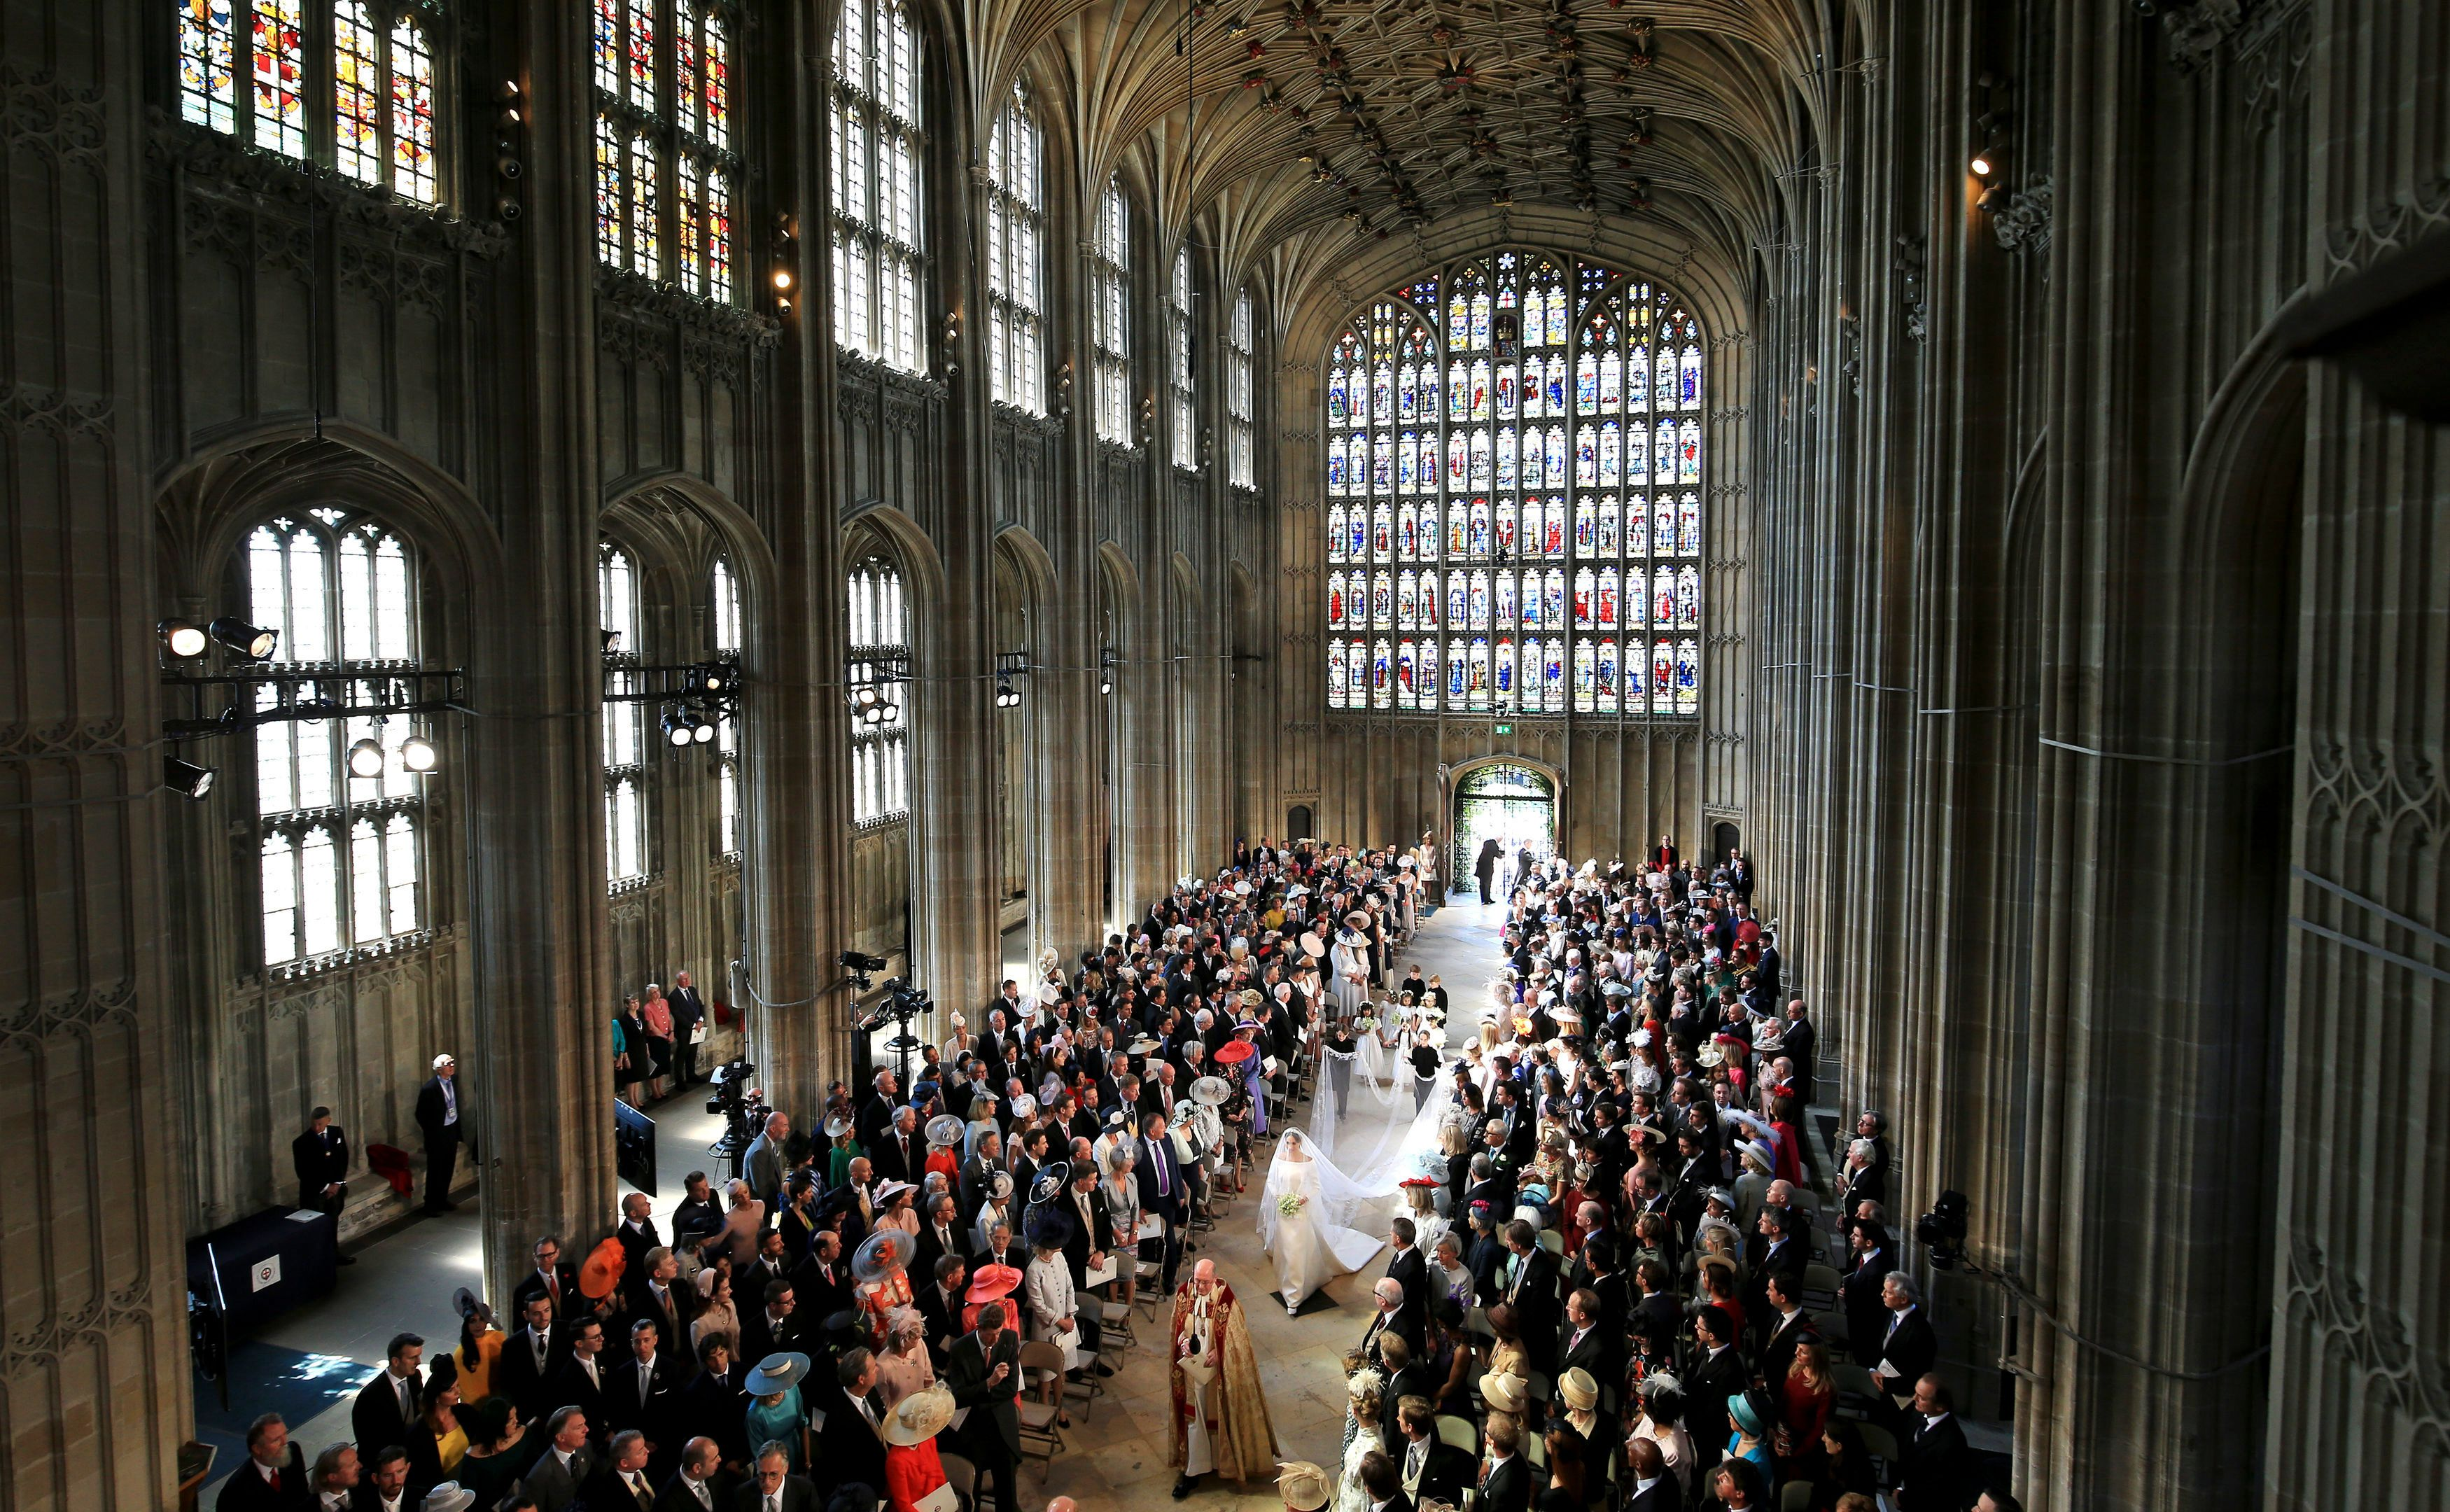 Meghan Markle Ceremony Entrance St. George's Chapel